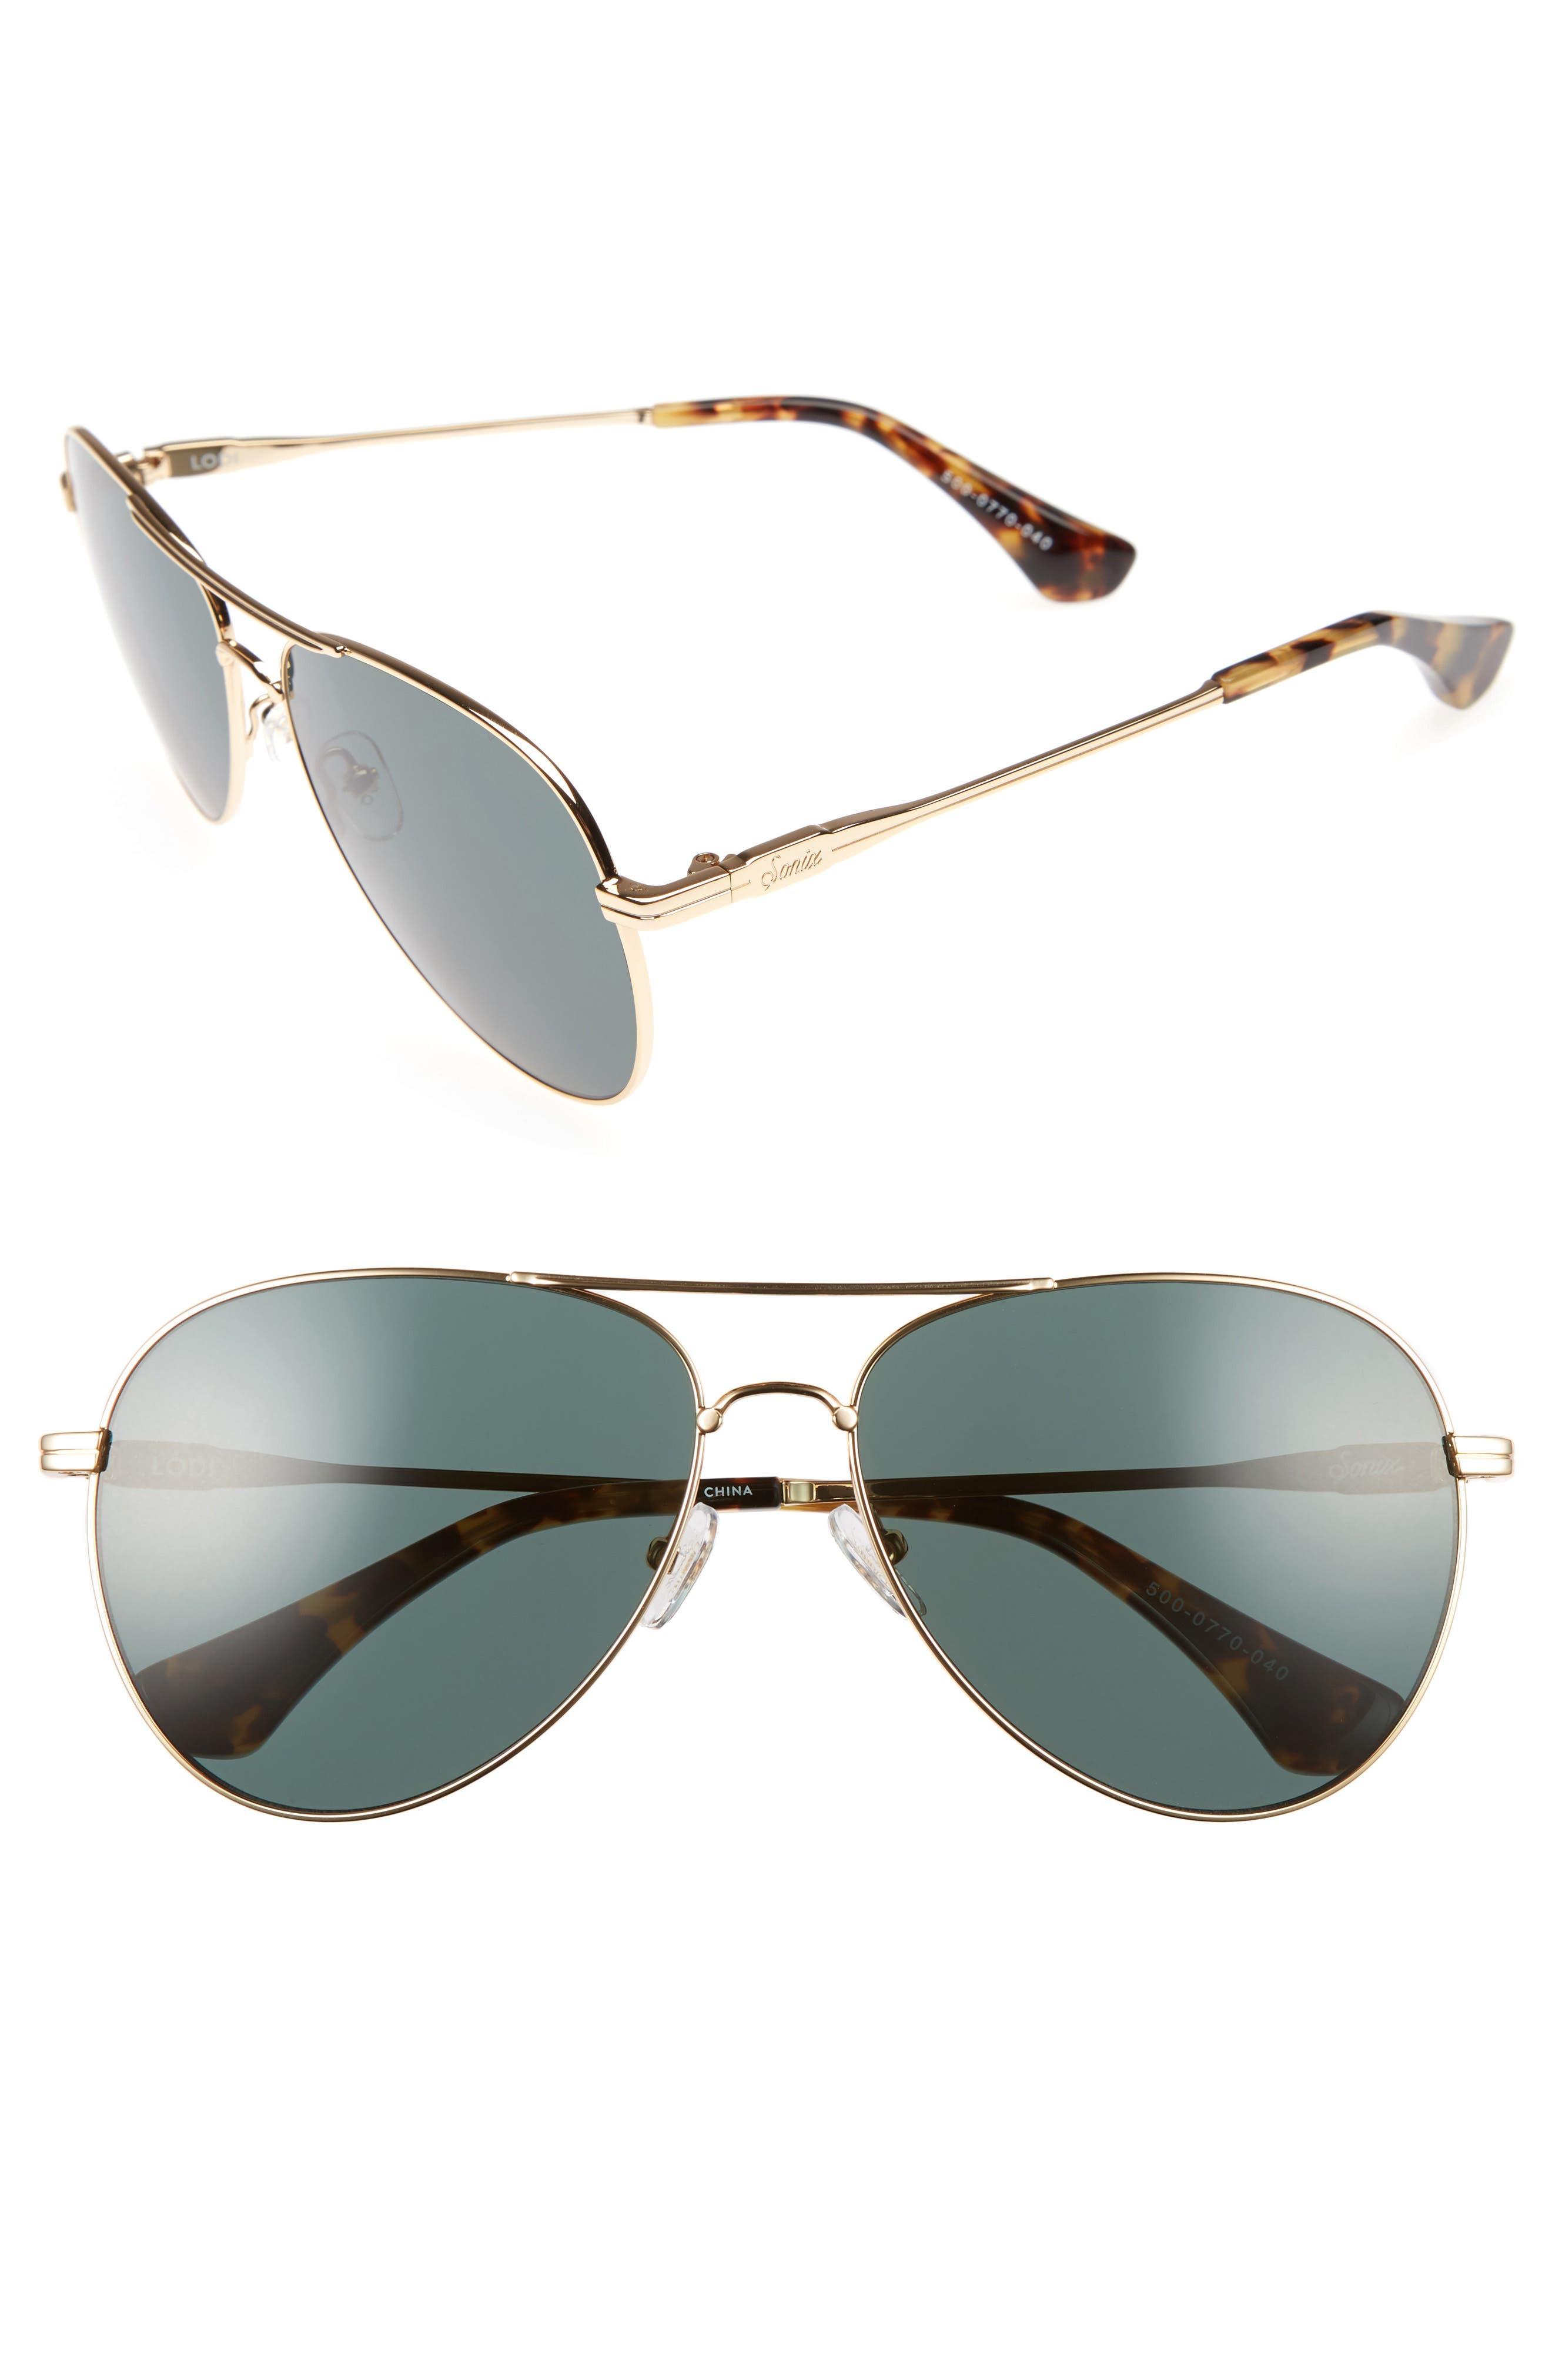 Lodi 62mm Mirrored Aviator Sunglasses,                             Main thumbnail 1, color,                             710